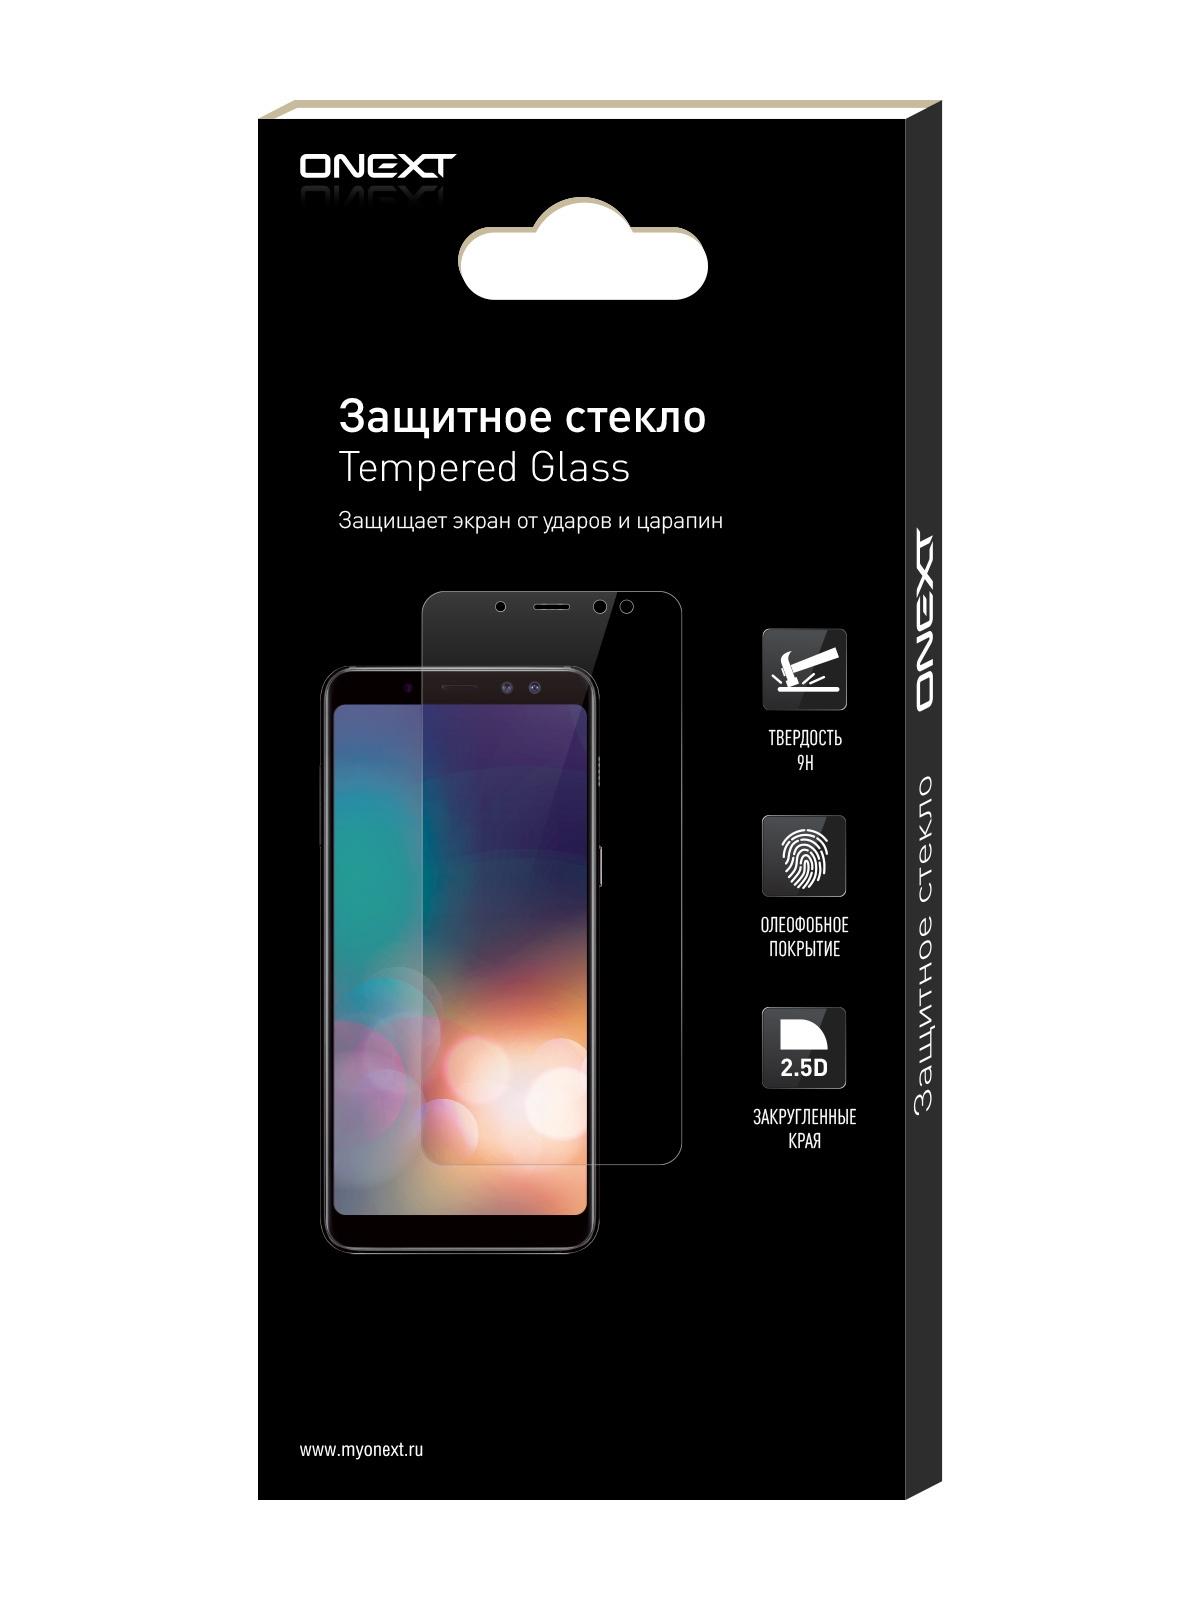 Защитное стекло ONEXT Samsung Galaxy J5 (2016) защитное стекло для samsung galaxy j5 2016 sm j510fn onext